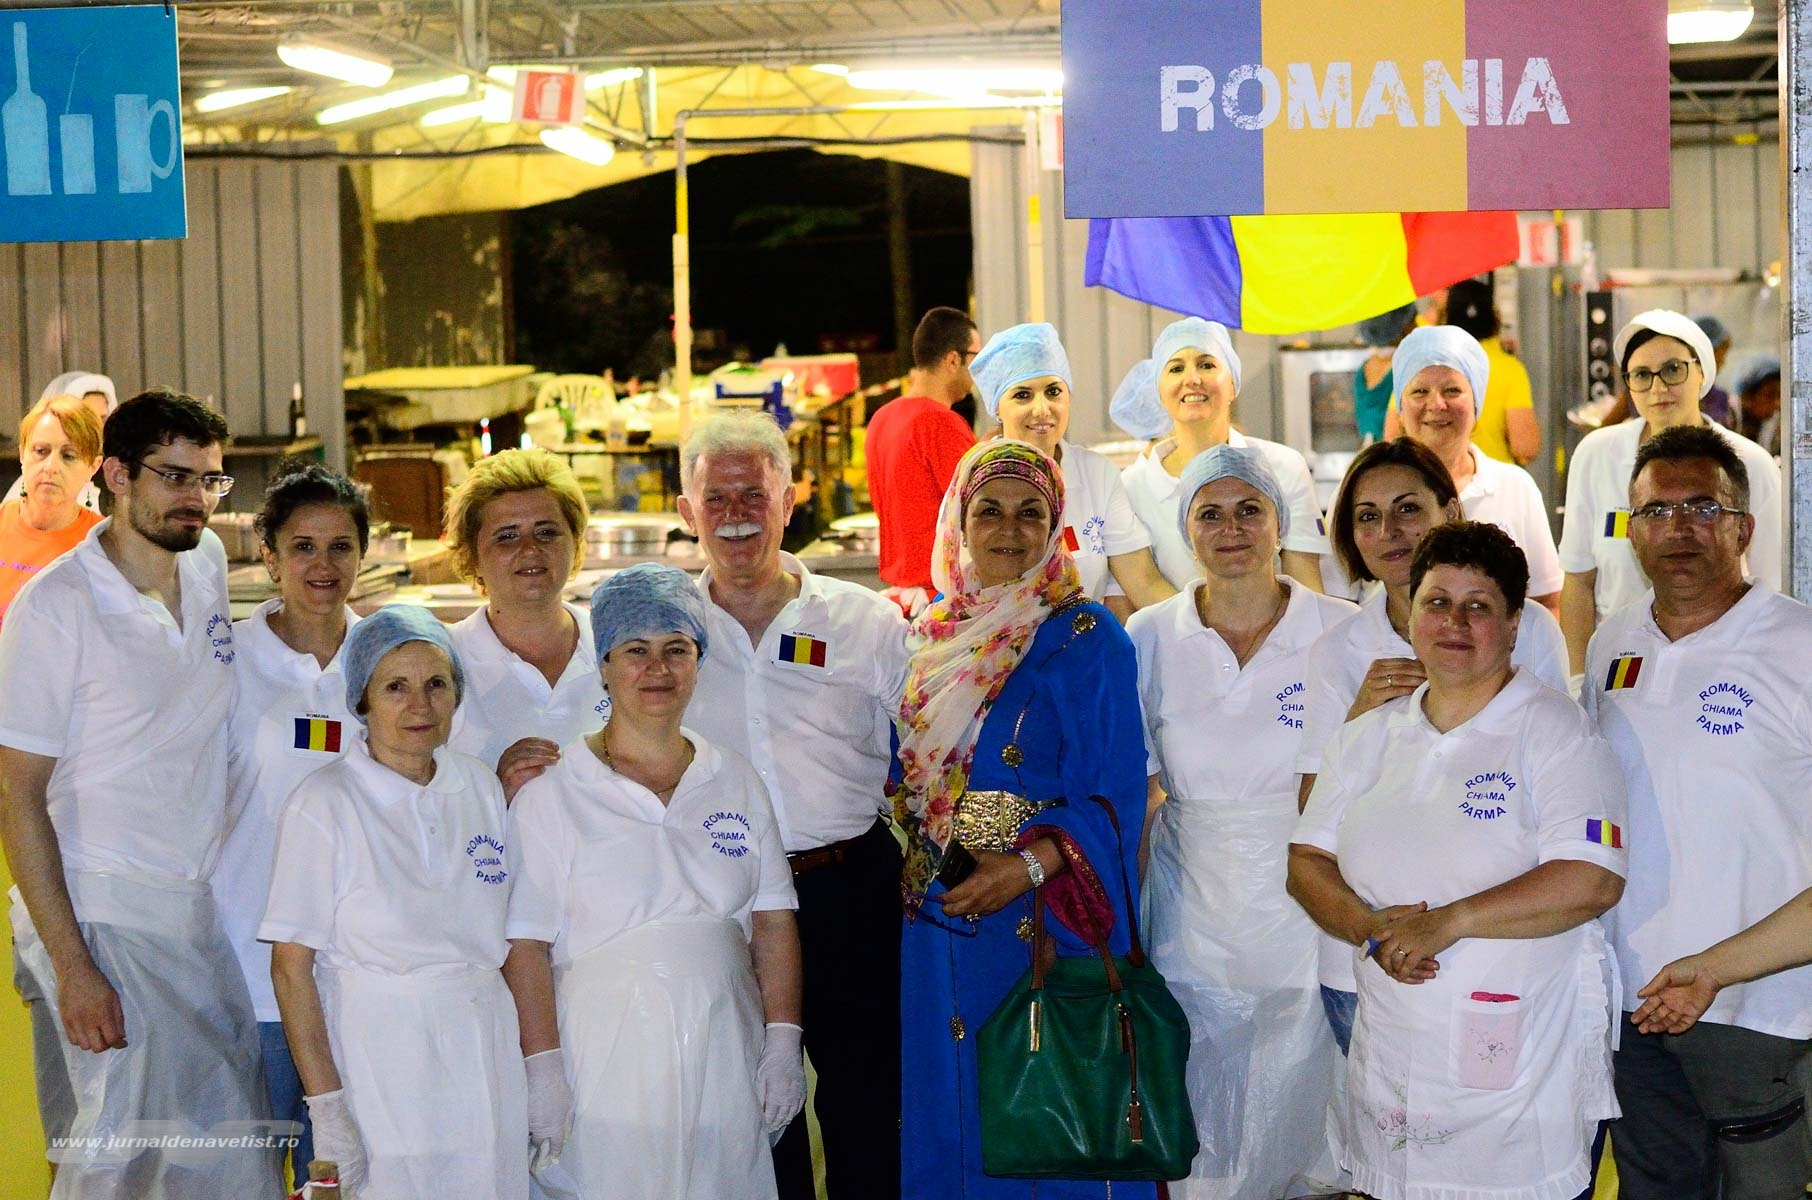 Romania Chiama Parma 7681